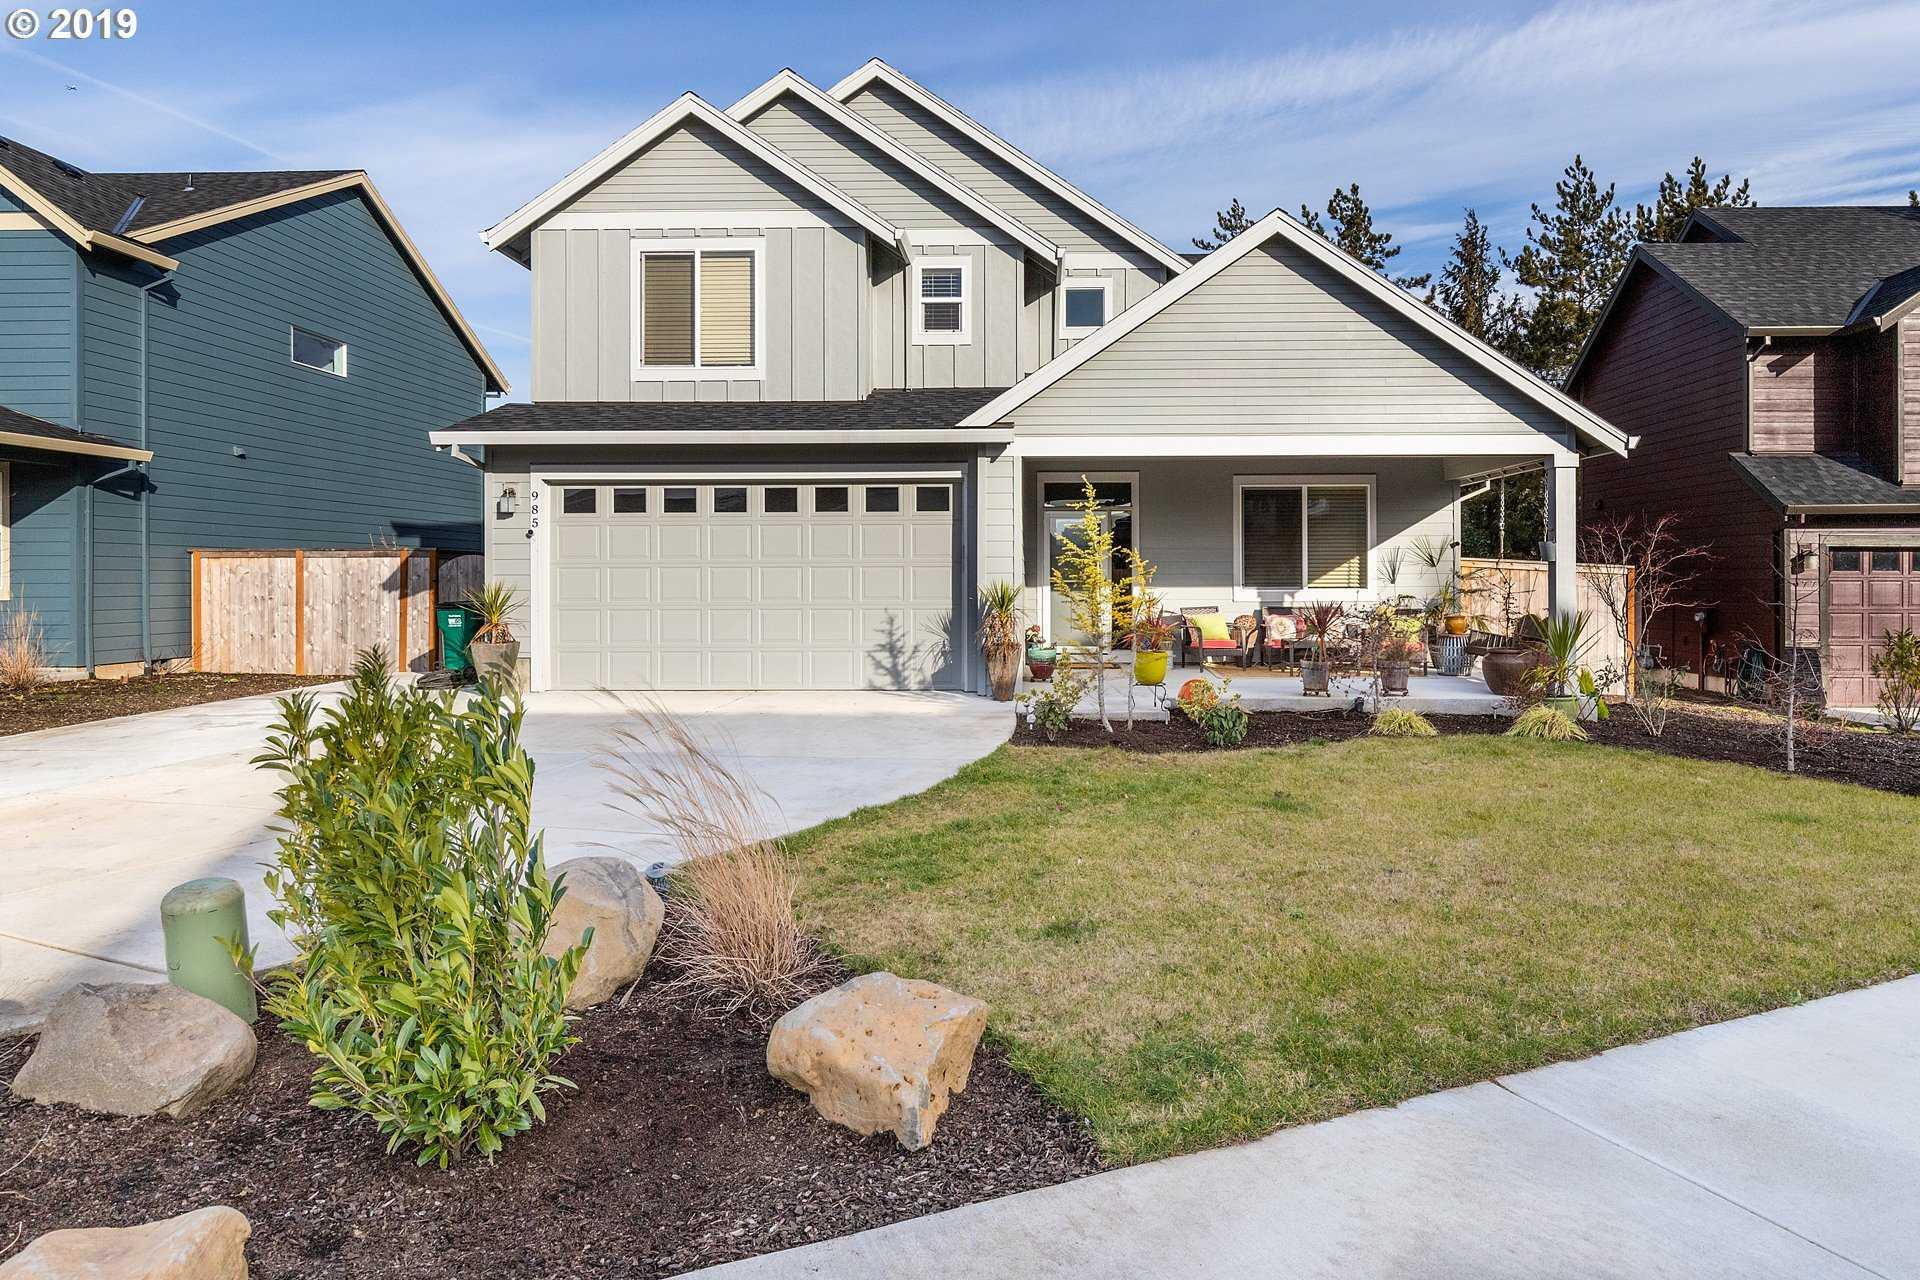 $485,000 - 4Br/3Ba -  for Sale in Gateway Estates, Troutdale